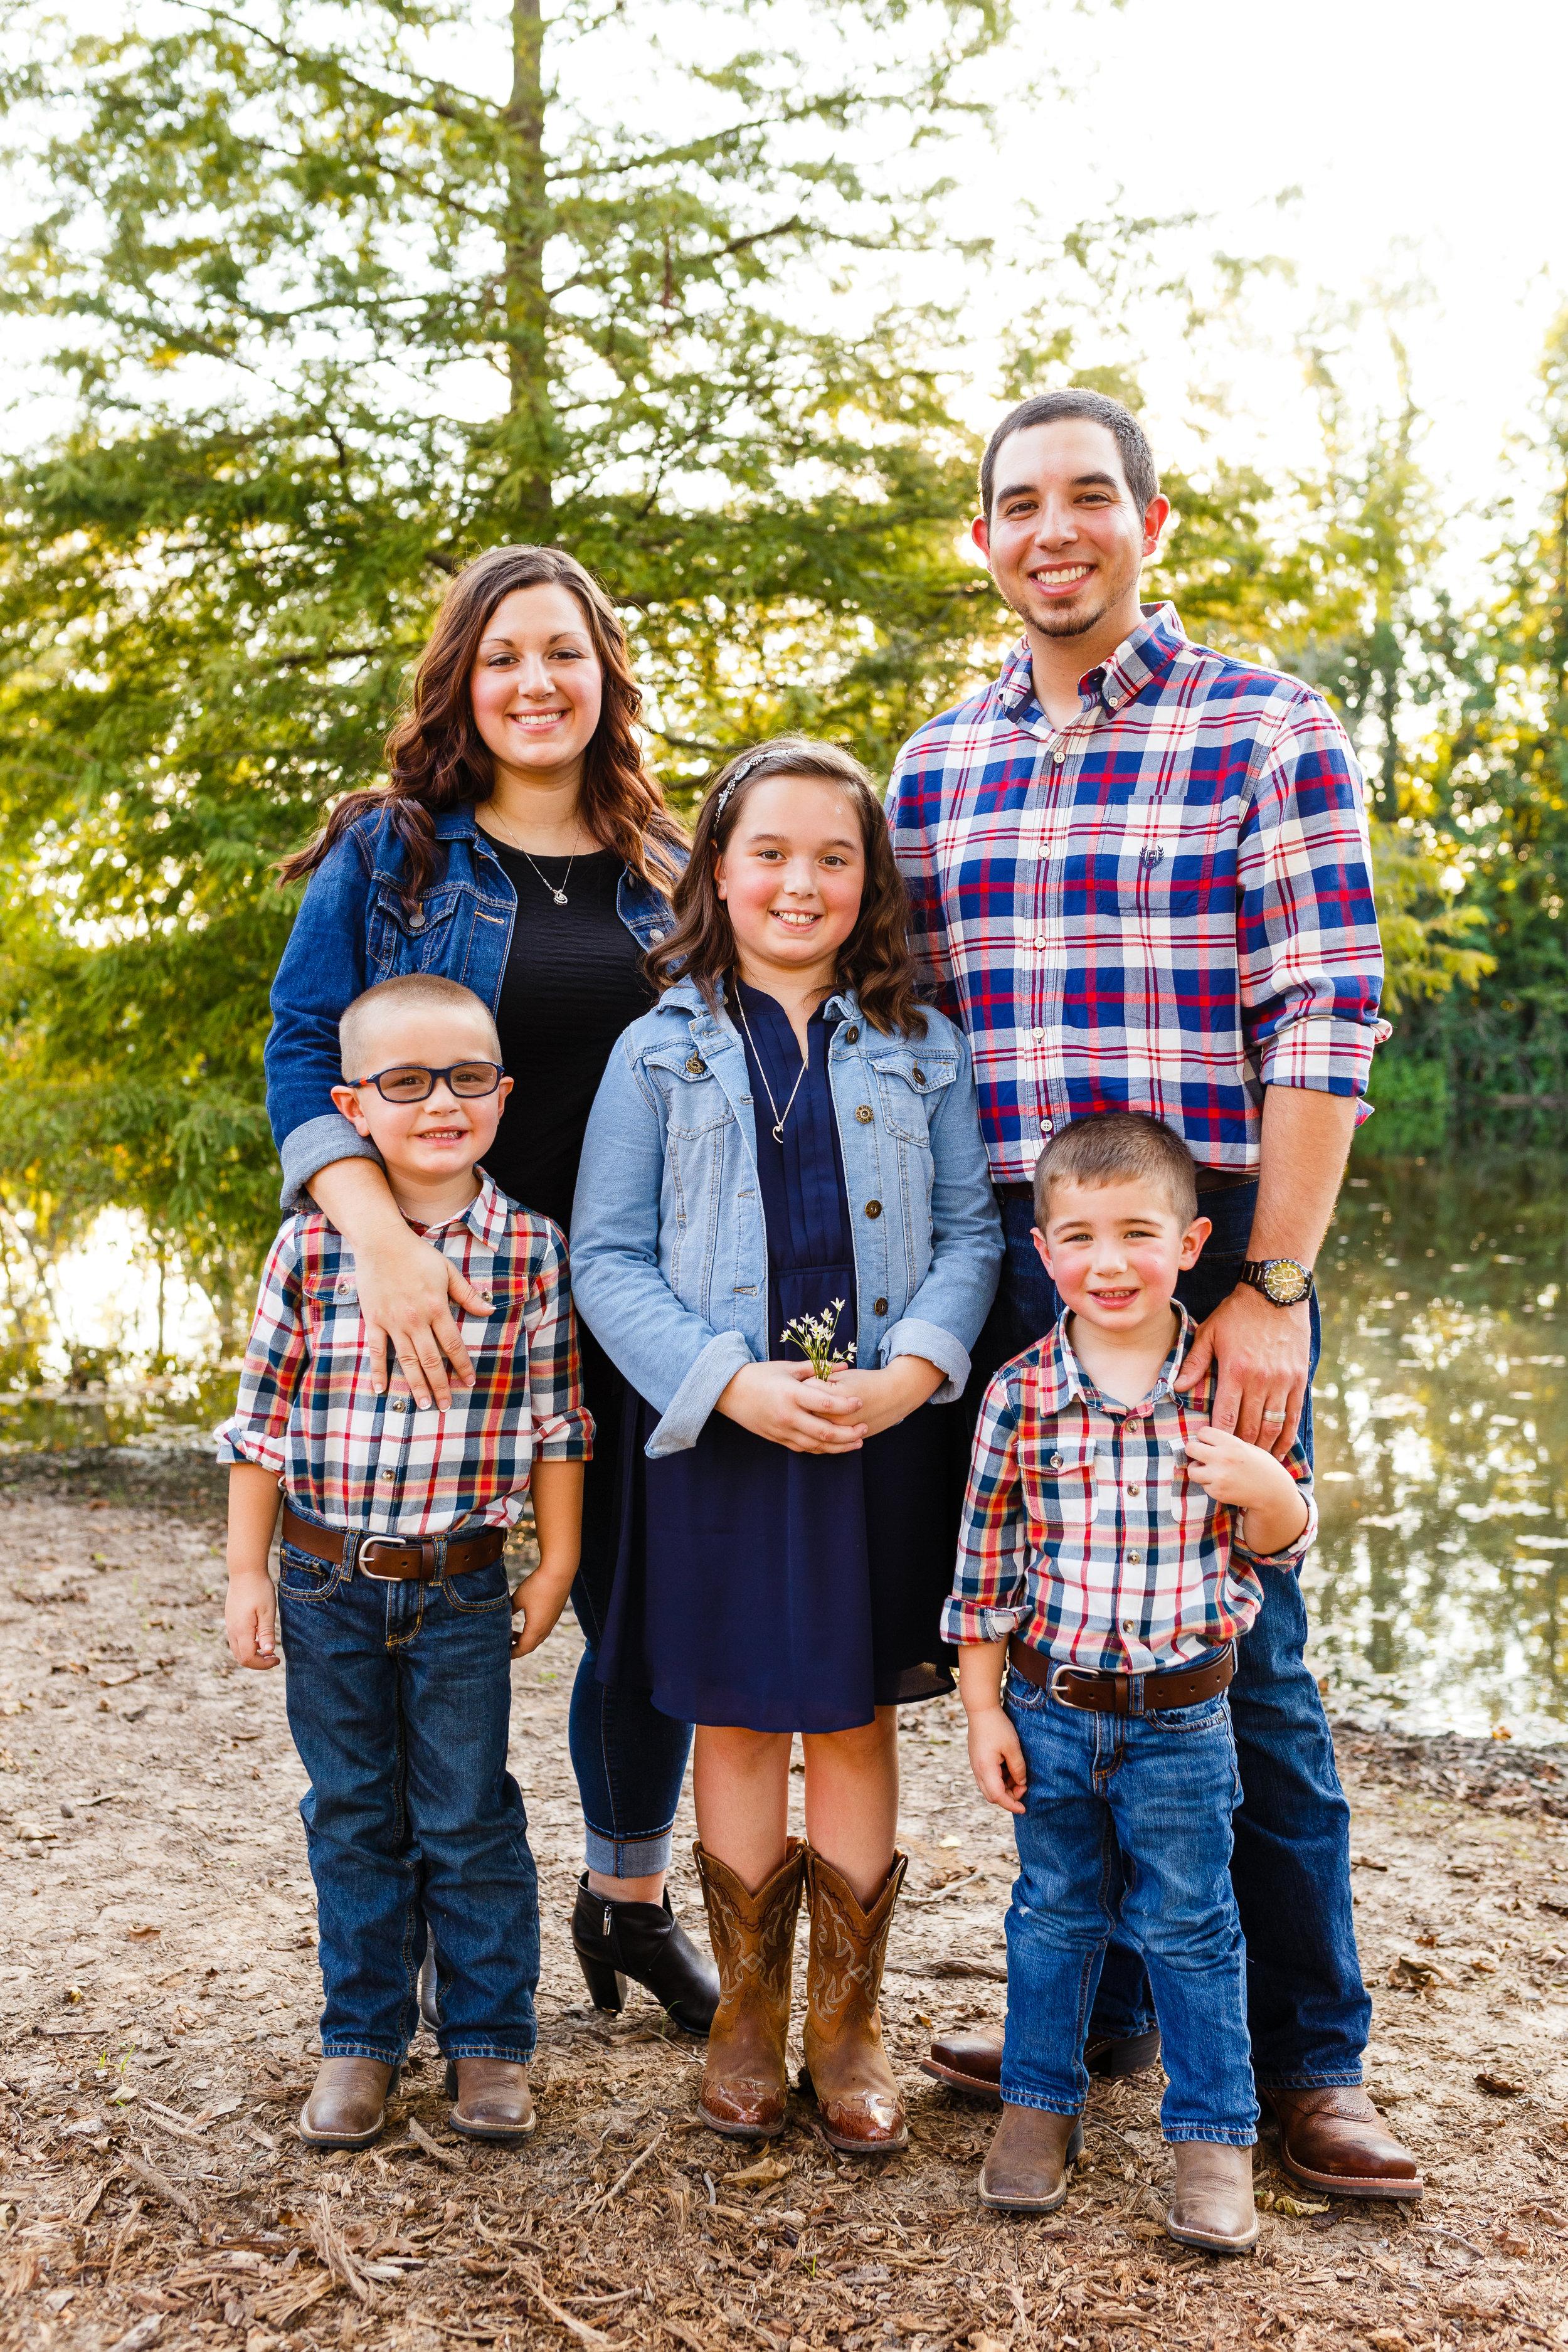 Family-child-portrait-lafayette-broussard-youngsville-photographer-19.jpg